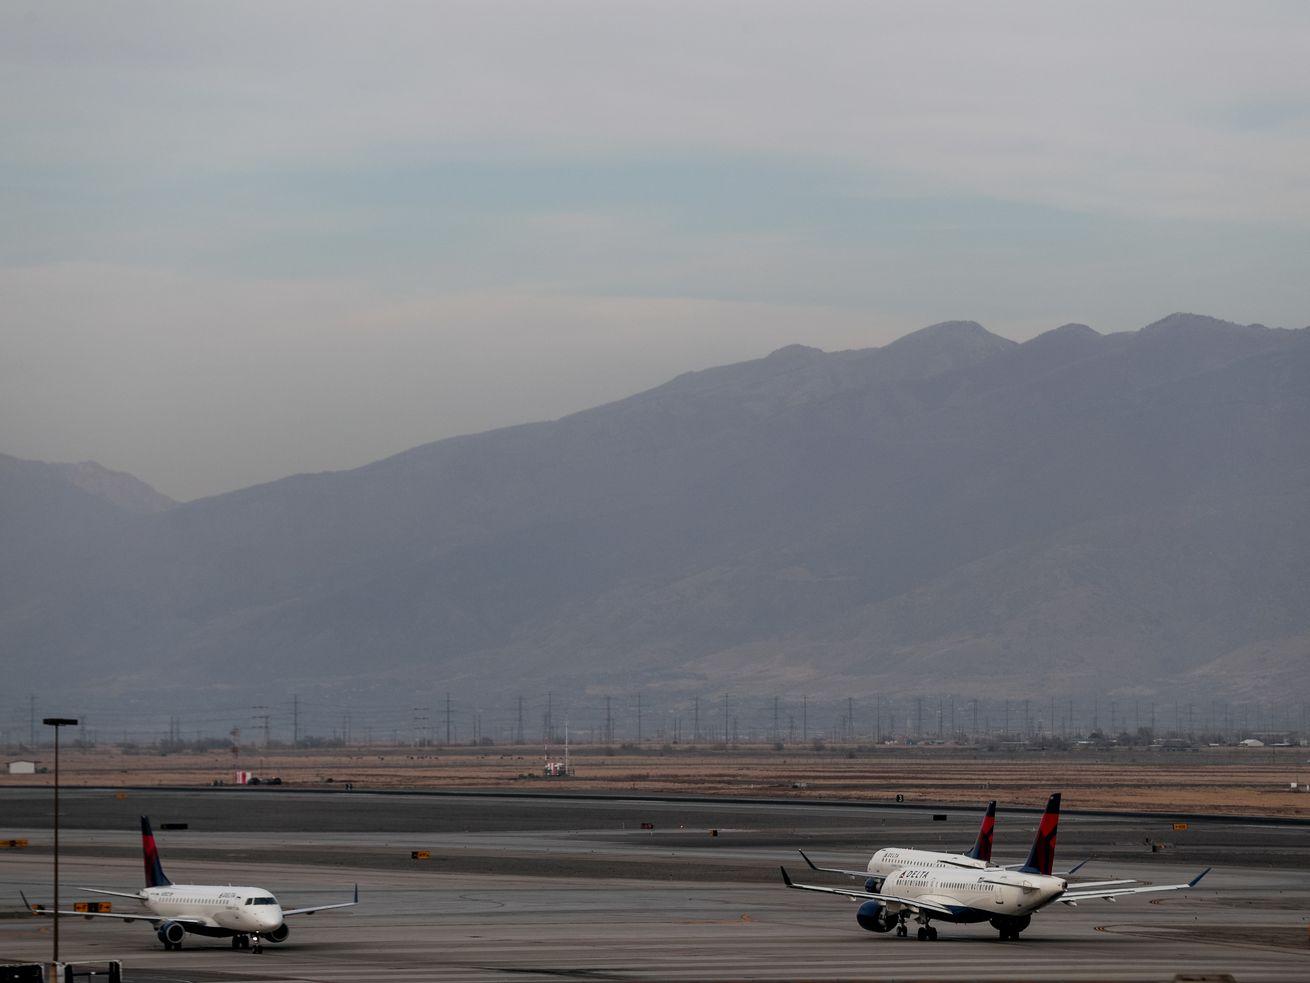 Delta aircraft taxi at Salt Lake International Airport in Salt Lake City. A Delta flight from Atlanta had to make an emergency landing in Salt Lake City Monday